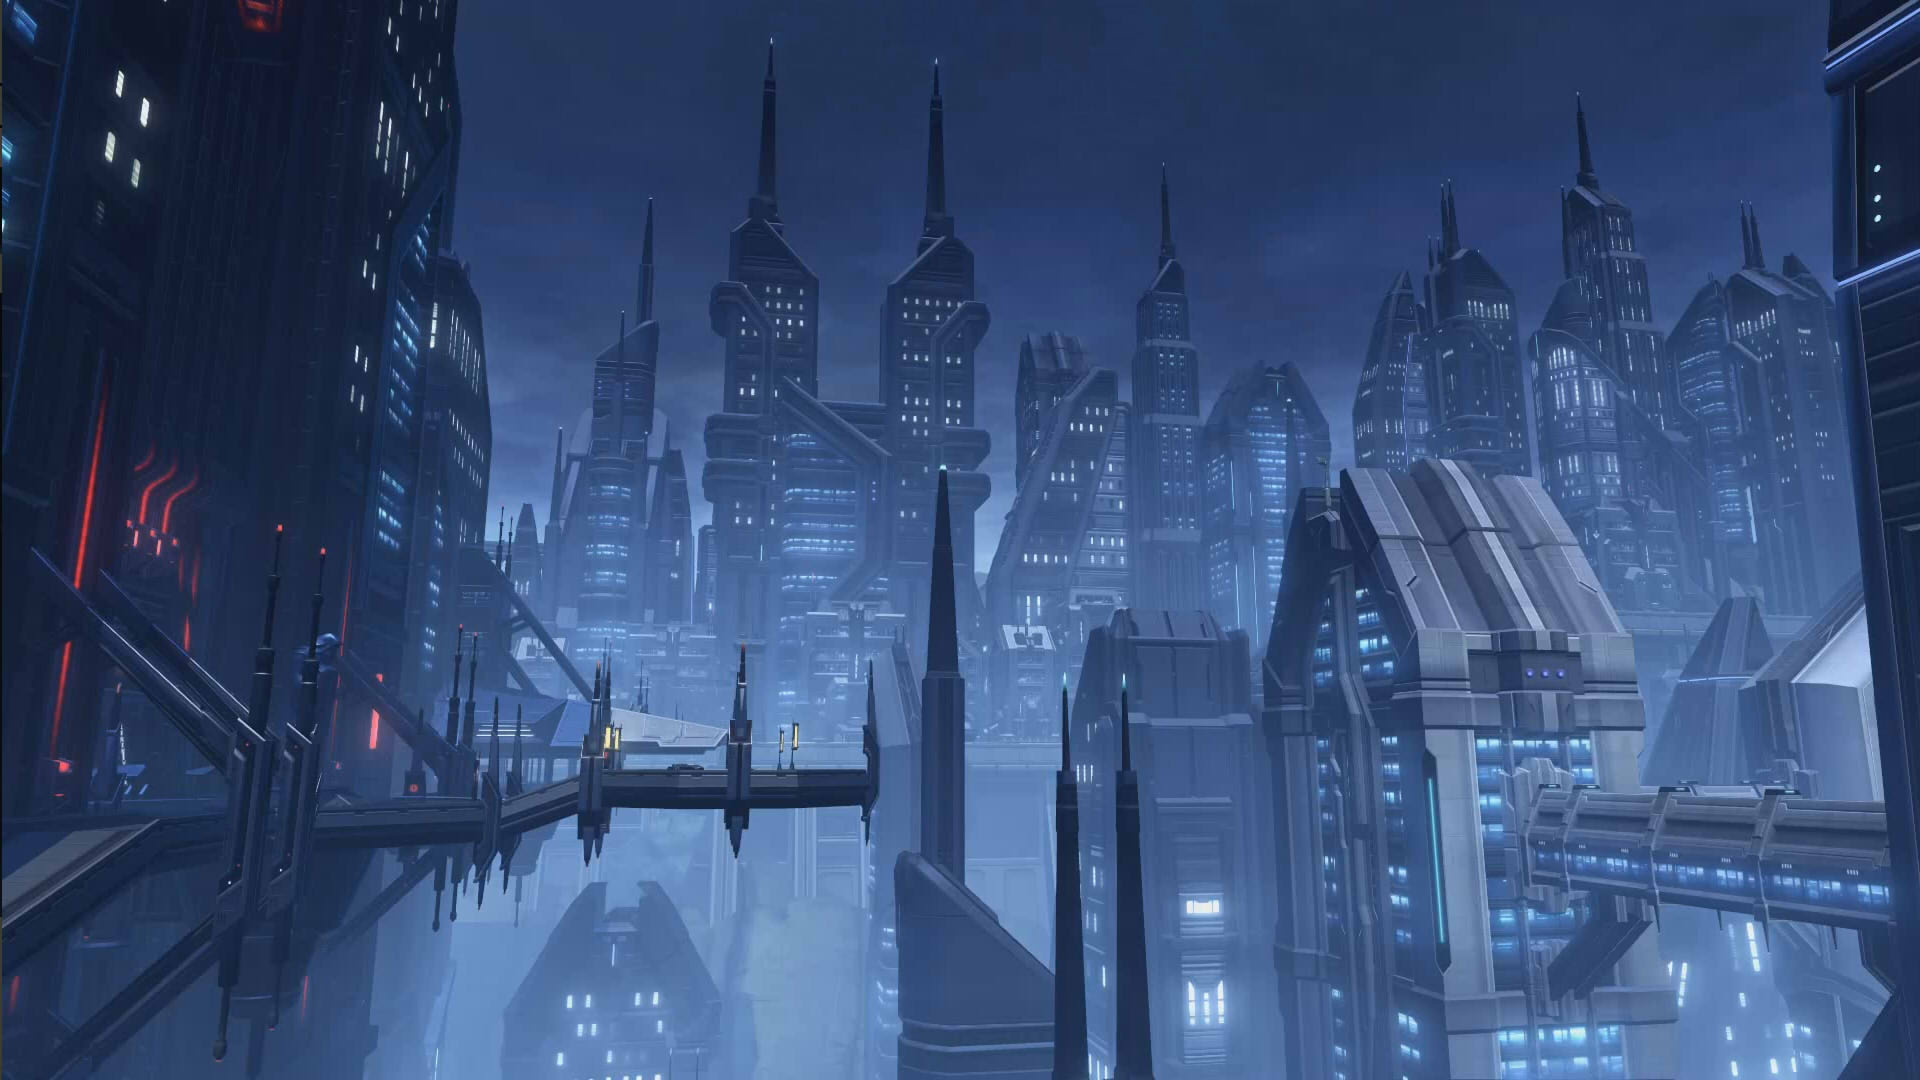 swtor_dromund_kaas_city_dreamscene_by_hi